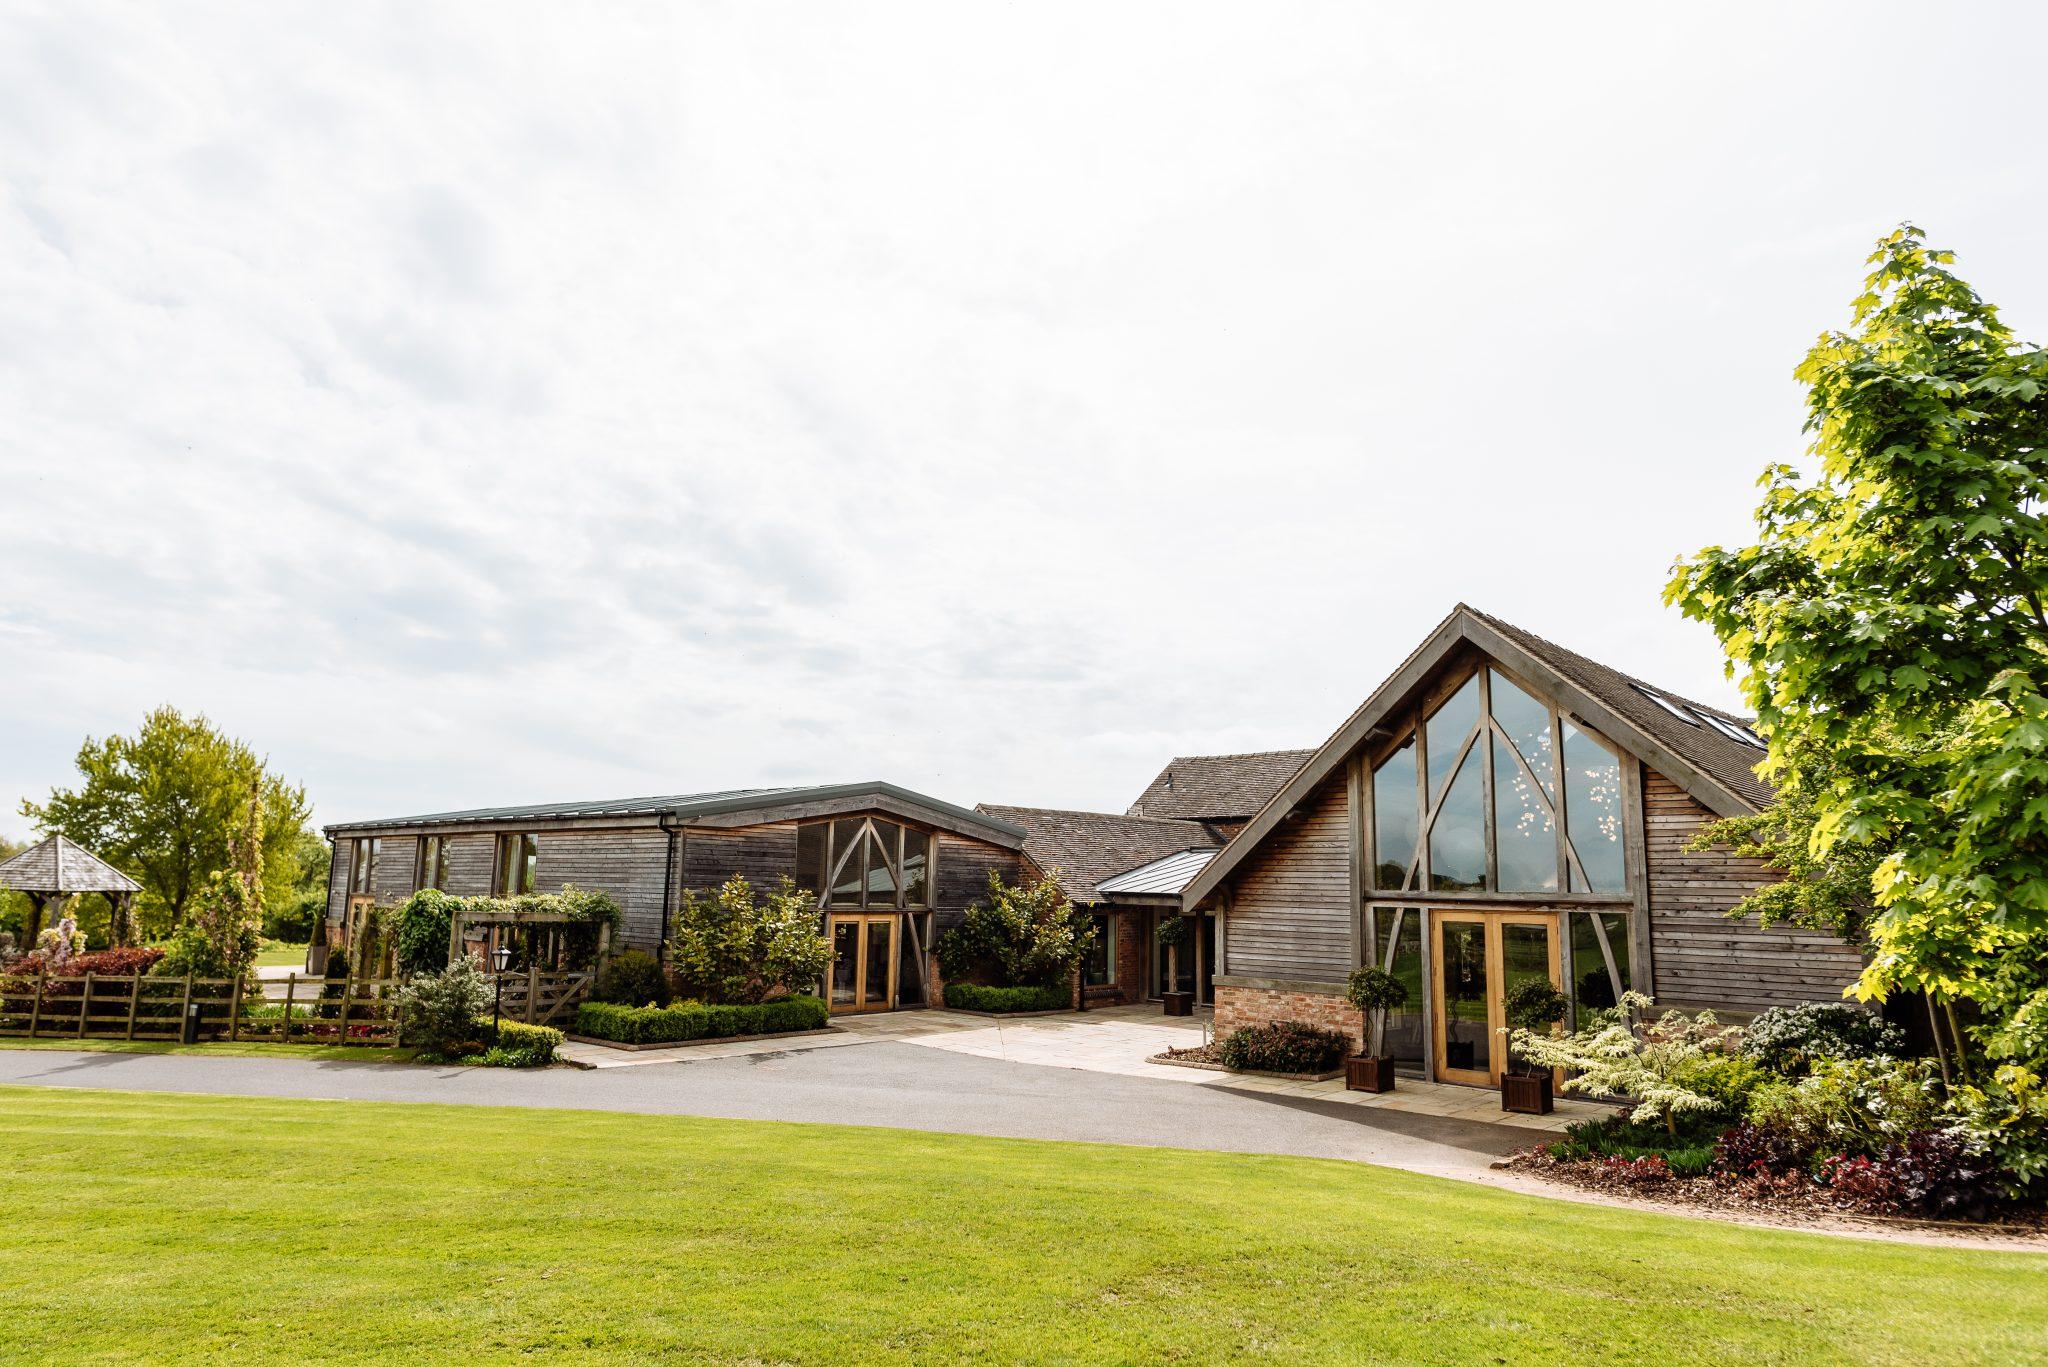 Top 10 East Midlands Wedding Venues East Midlands Wedding Venue